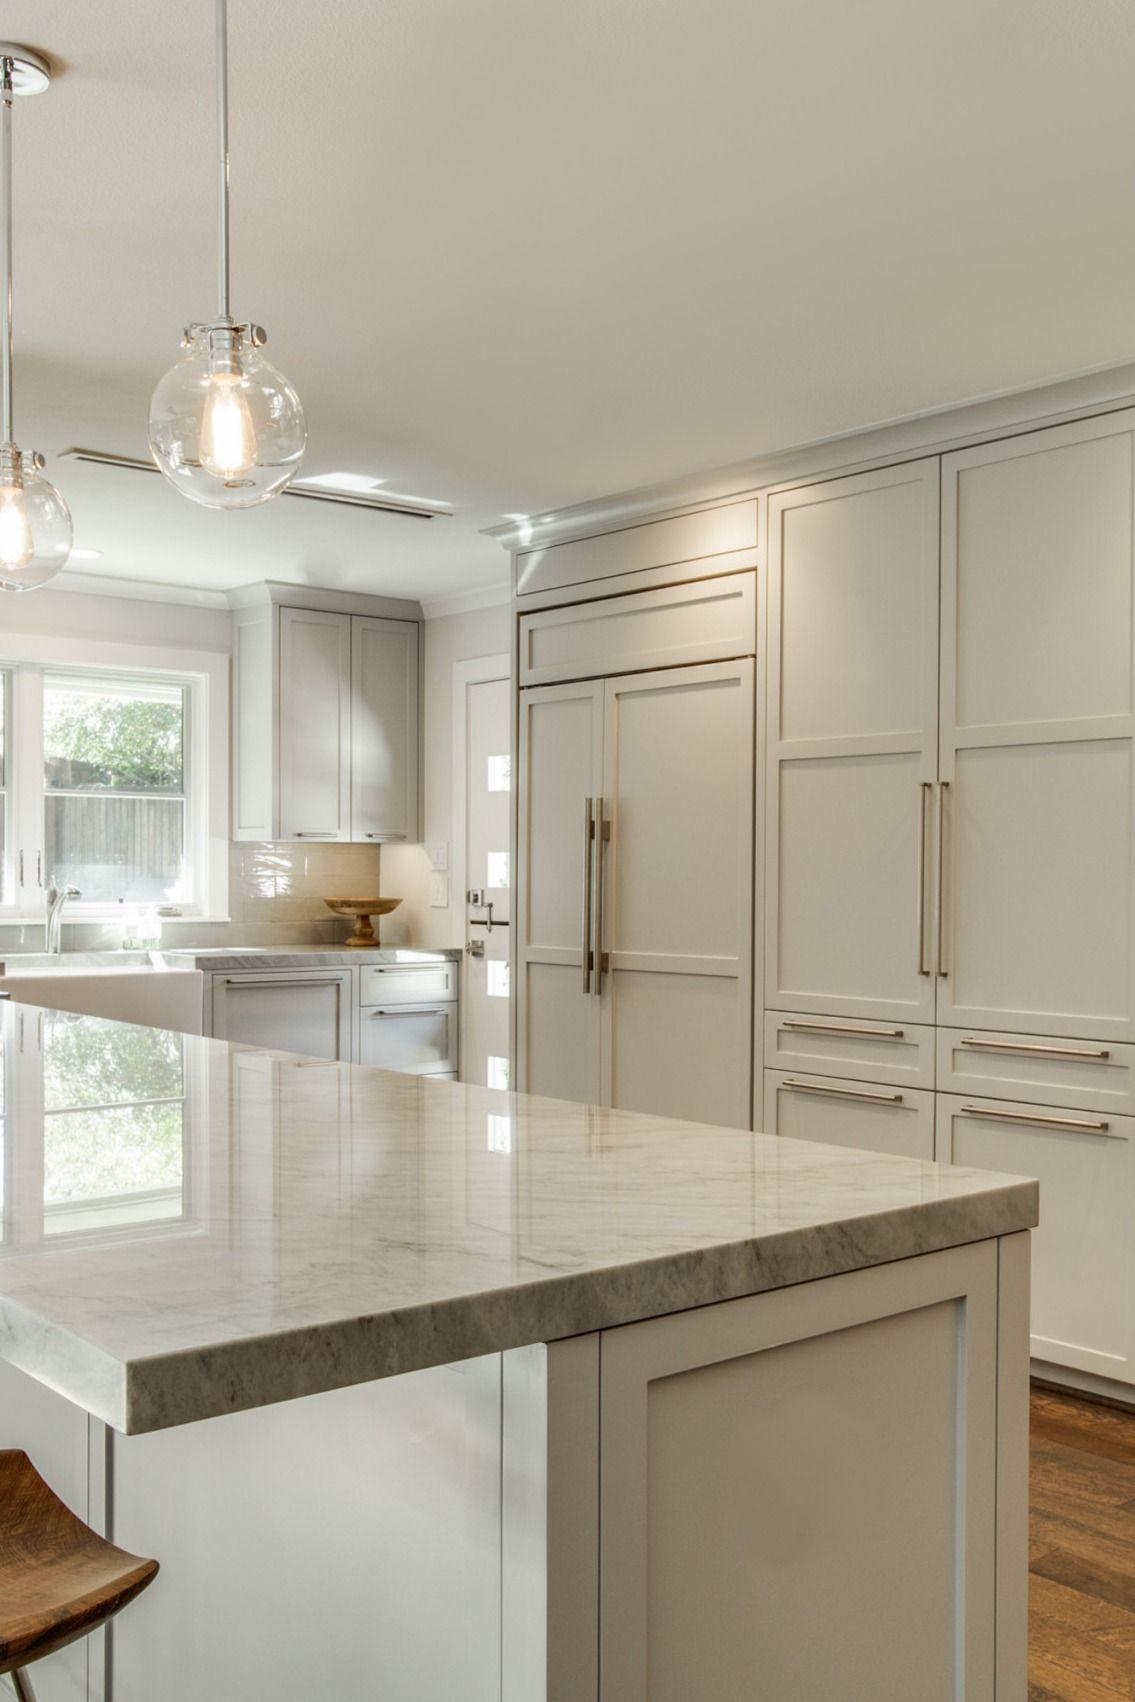 9 Most Popular Quartzite Kitchen Countertops Ideas in 9 ...